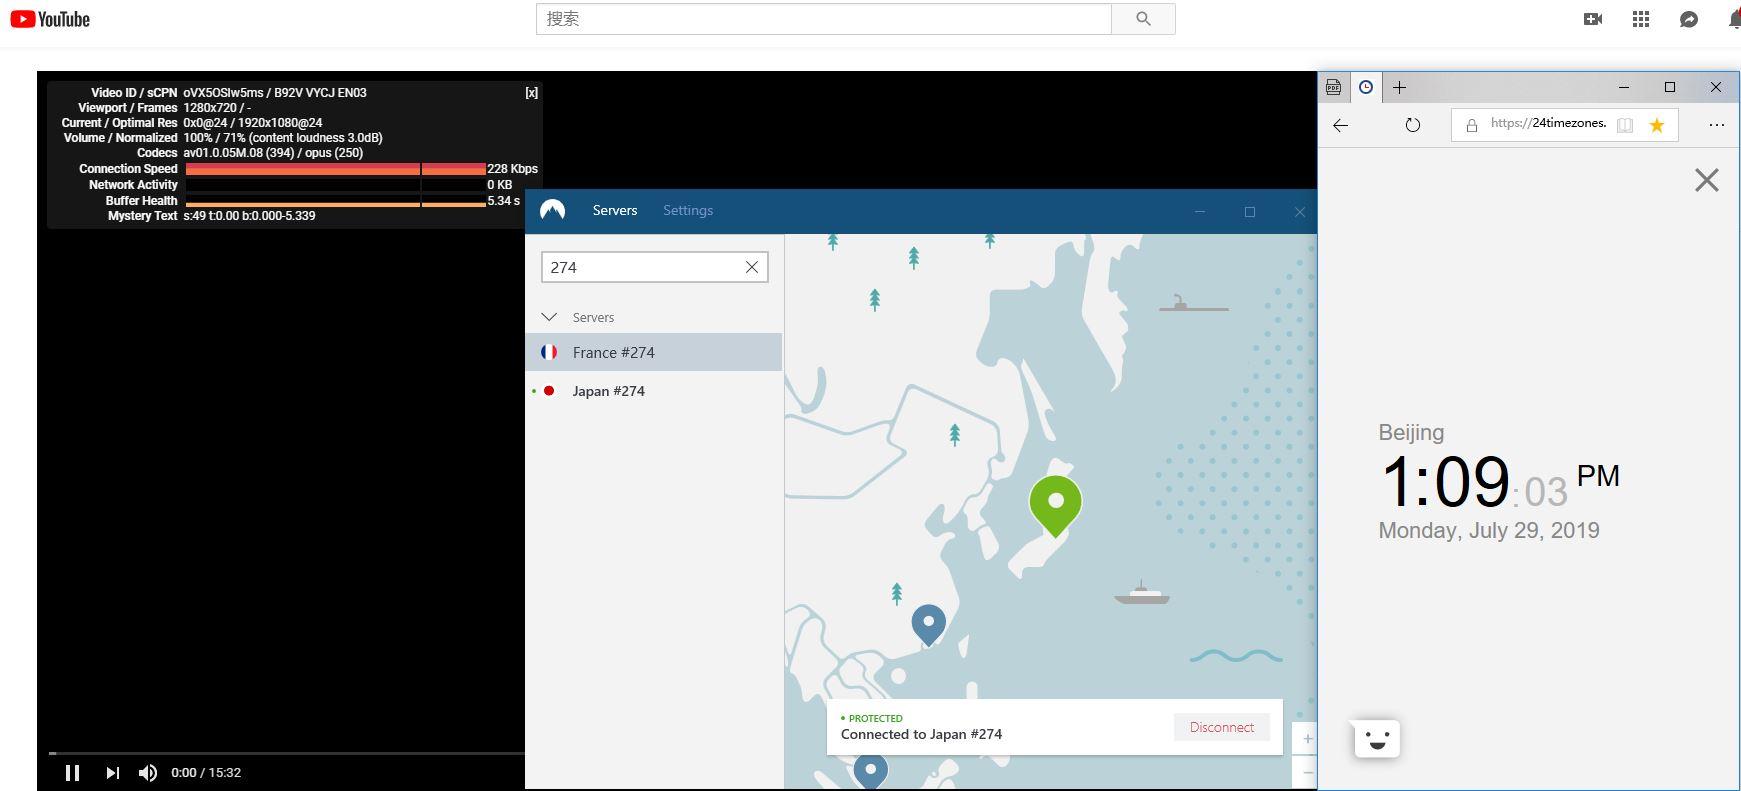 NordVPN Windows 中国翻墙 科学上网 日本 服务器节点-YouTube-20190729